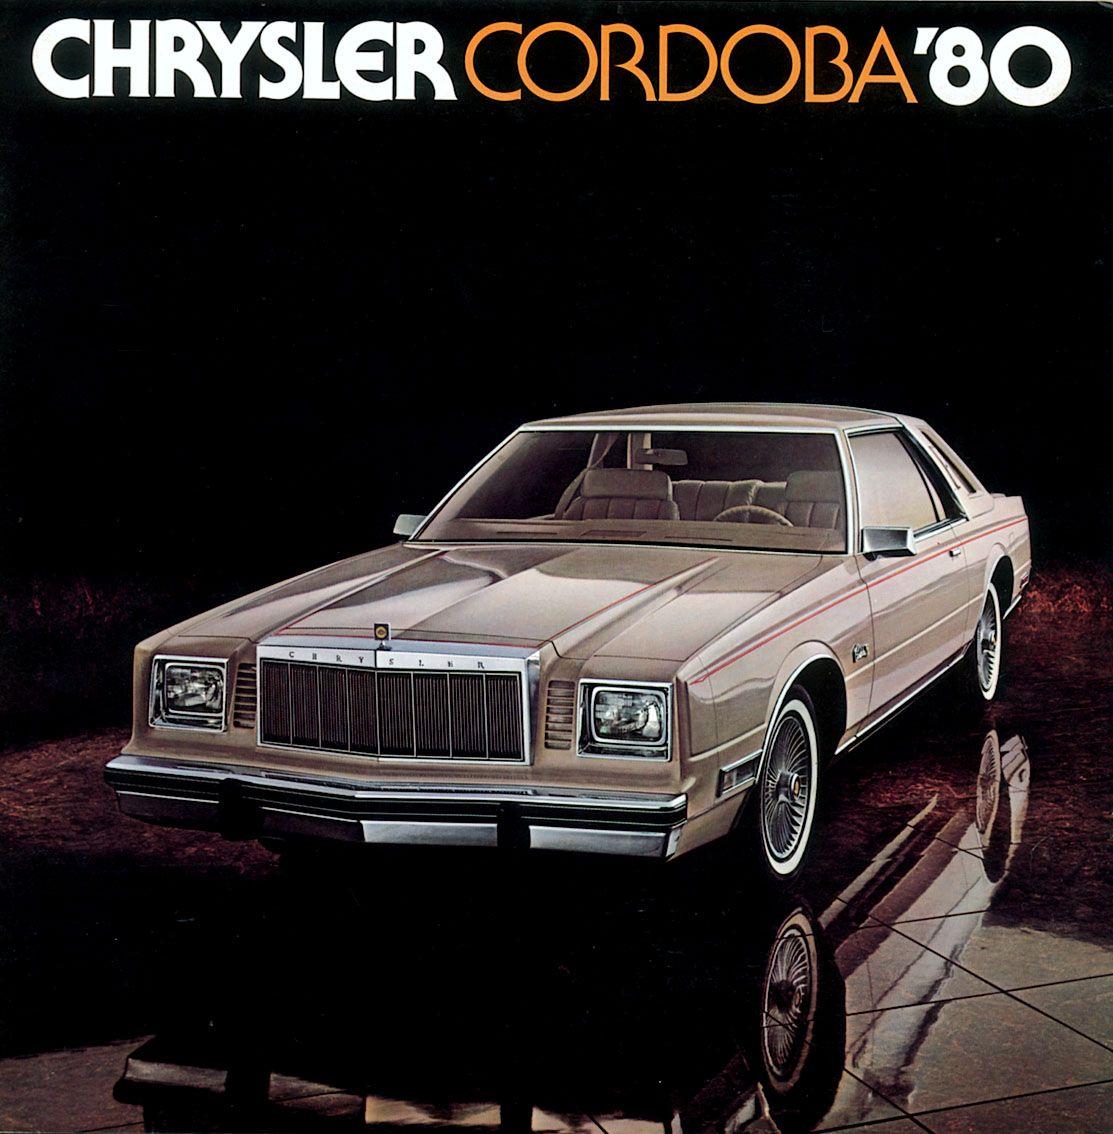 1980 Chrysler Cordoba 2-Door Coupe